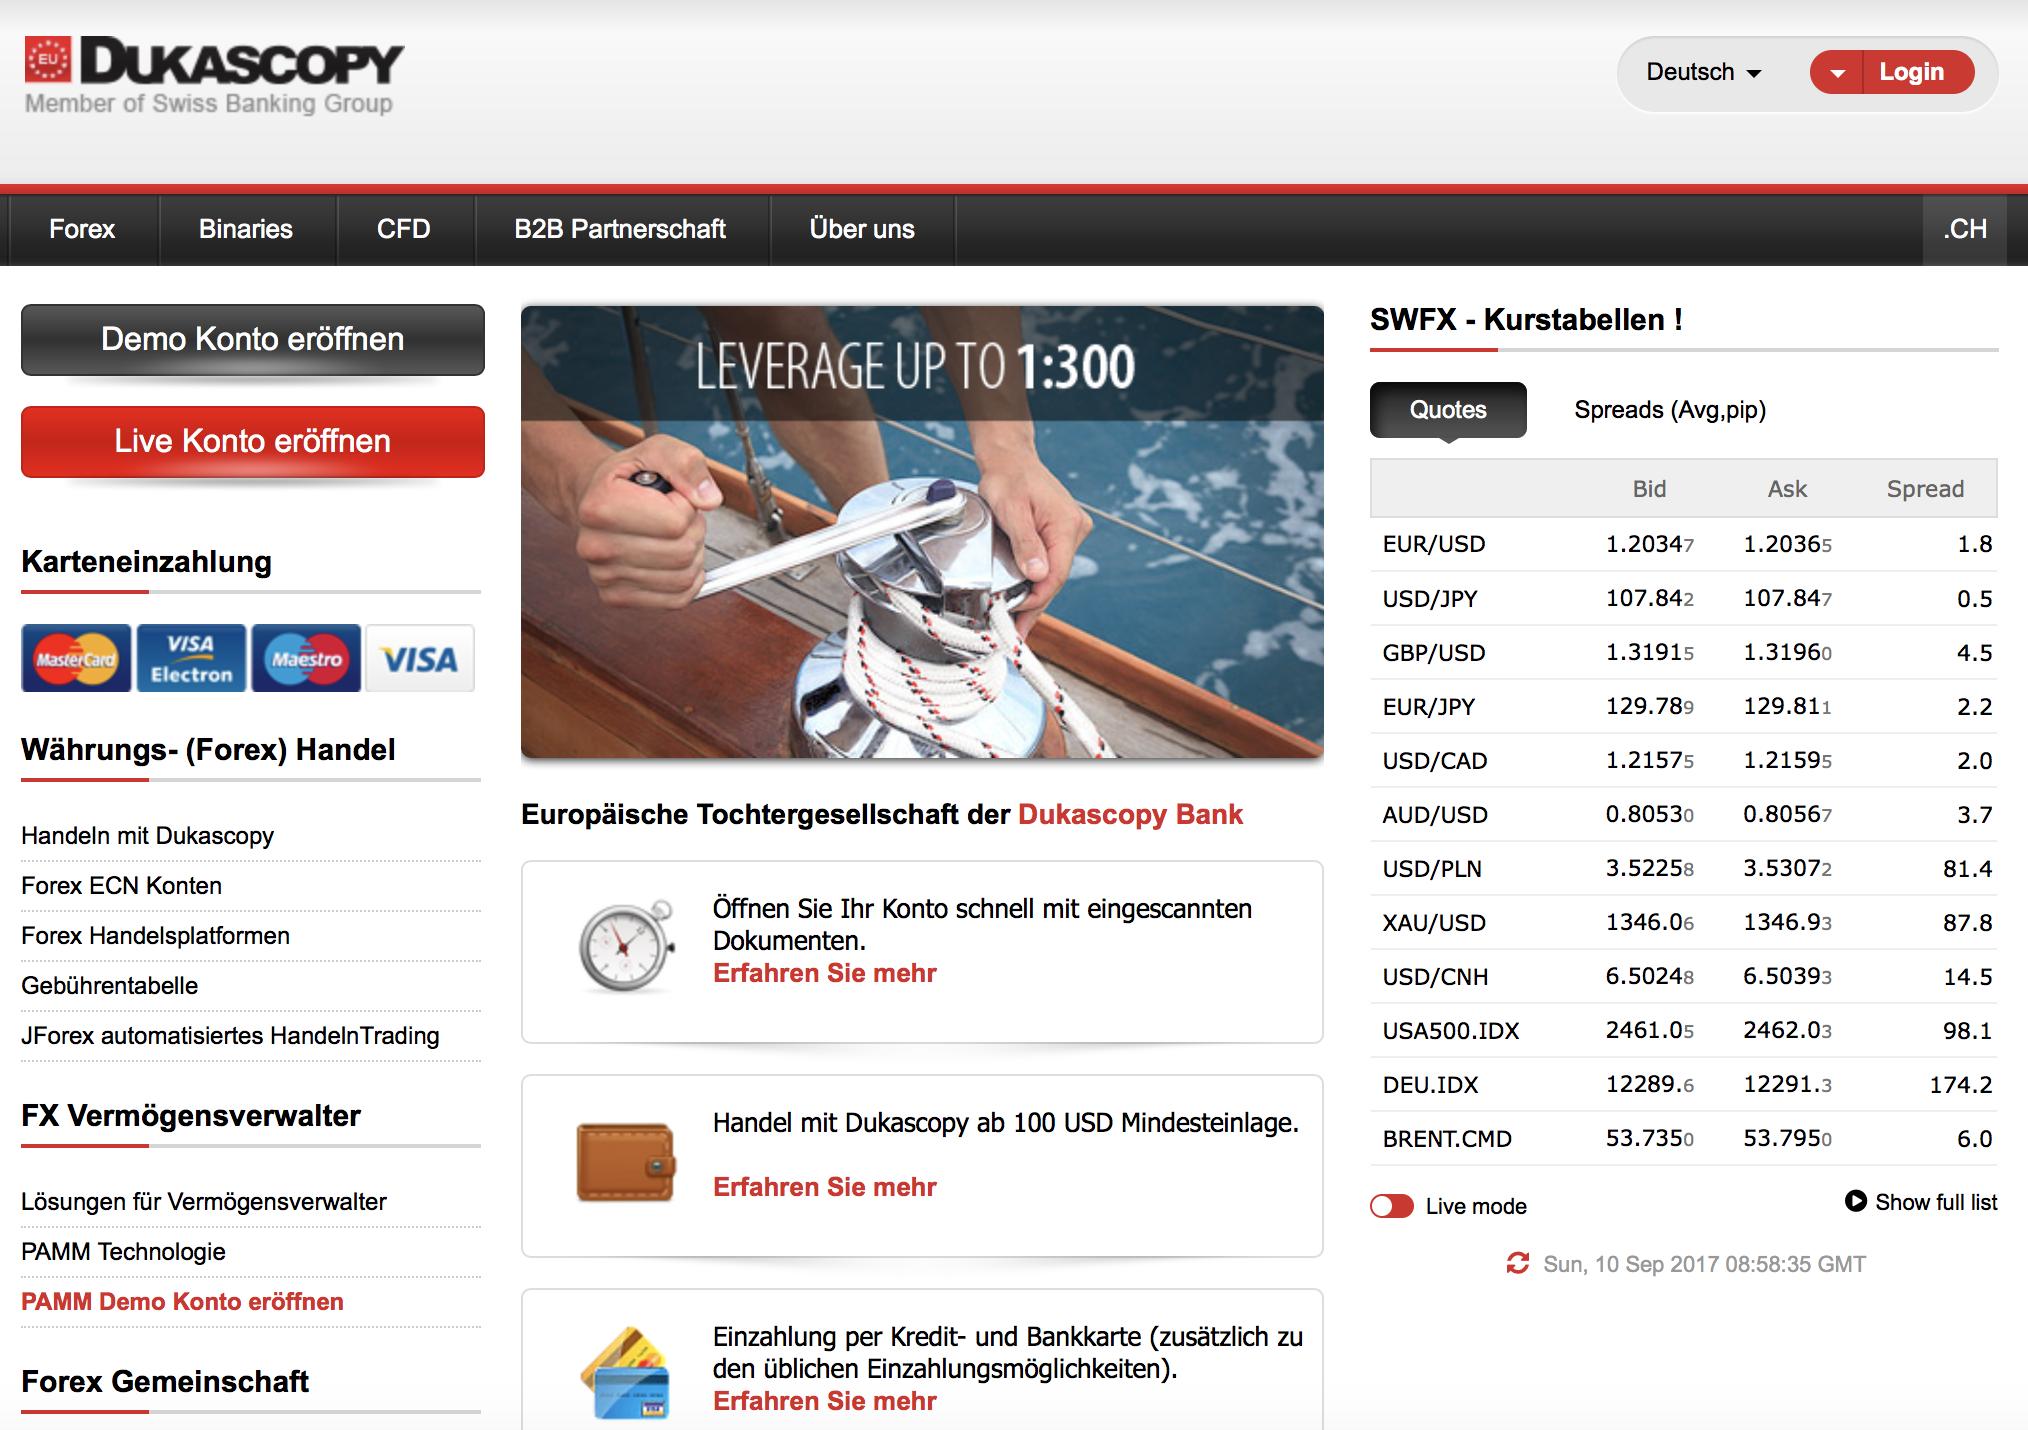 Website des Brokers Dukascopy